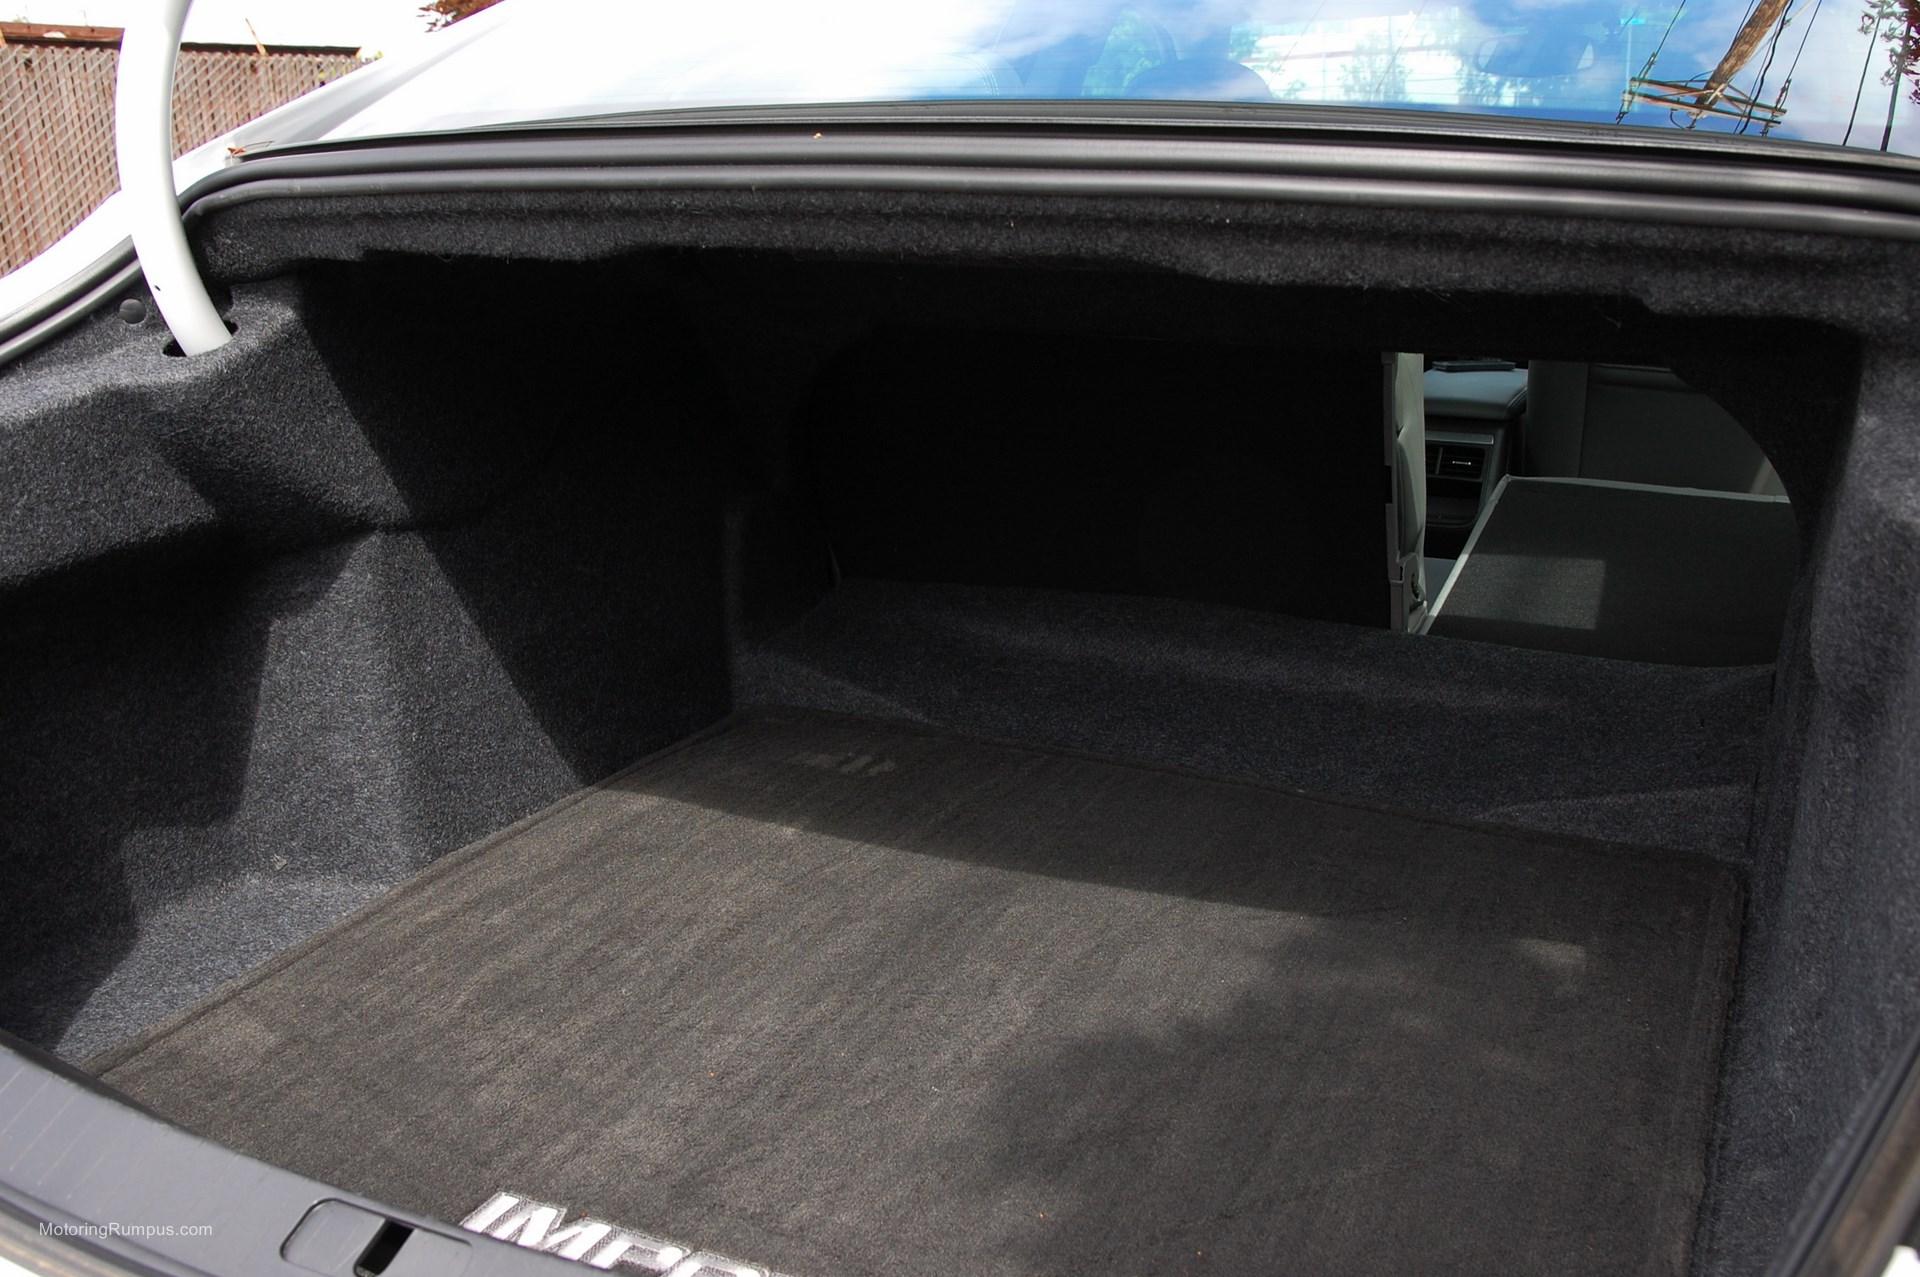 2014 Chevy Impala Review Motoring Rumpus